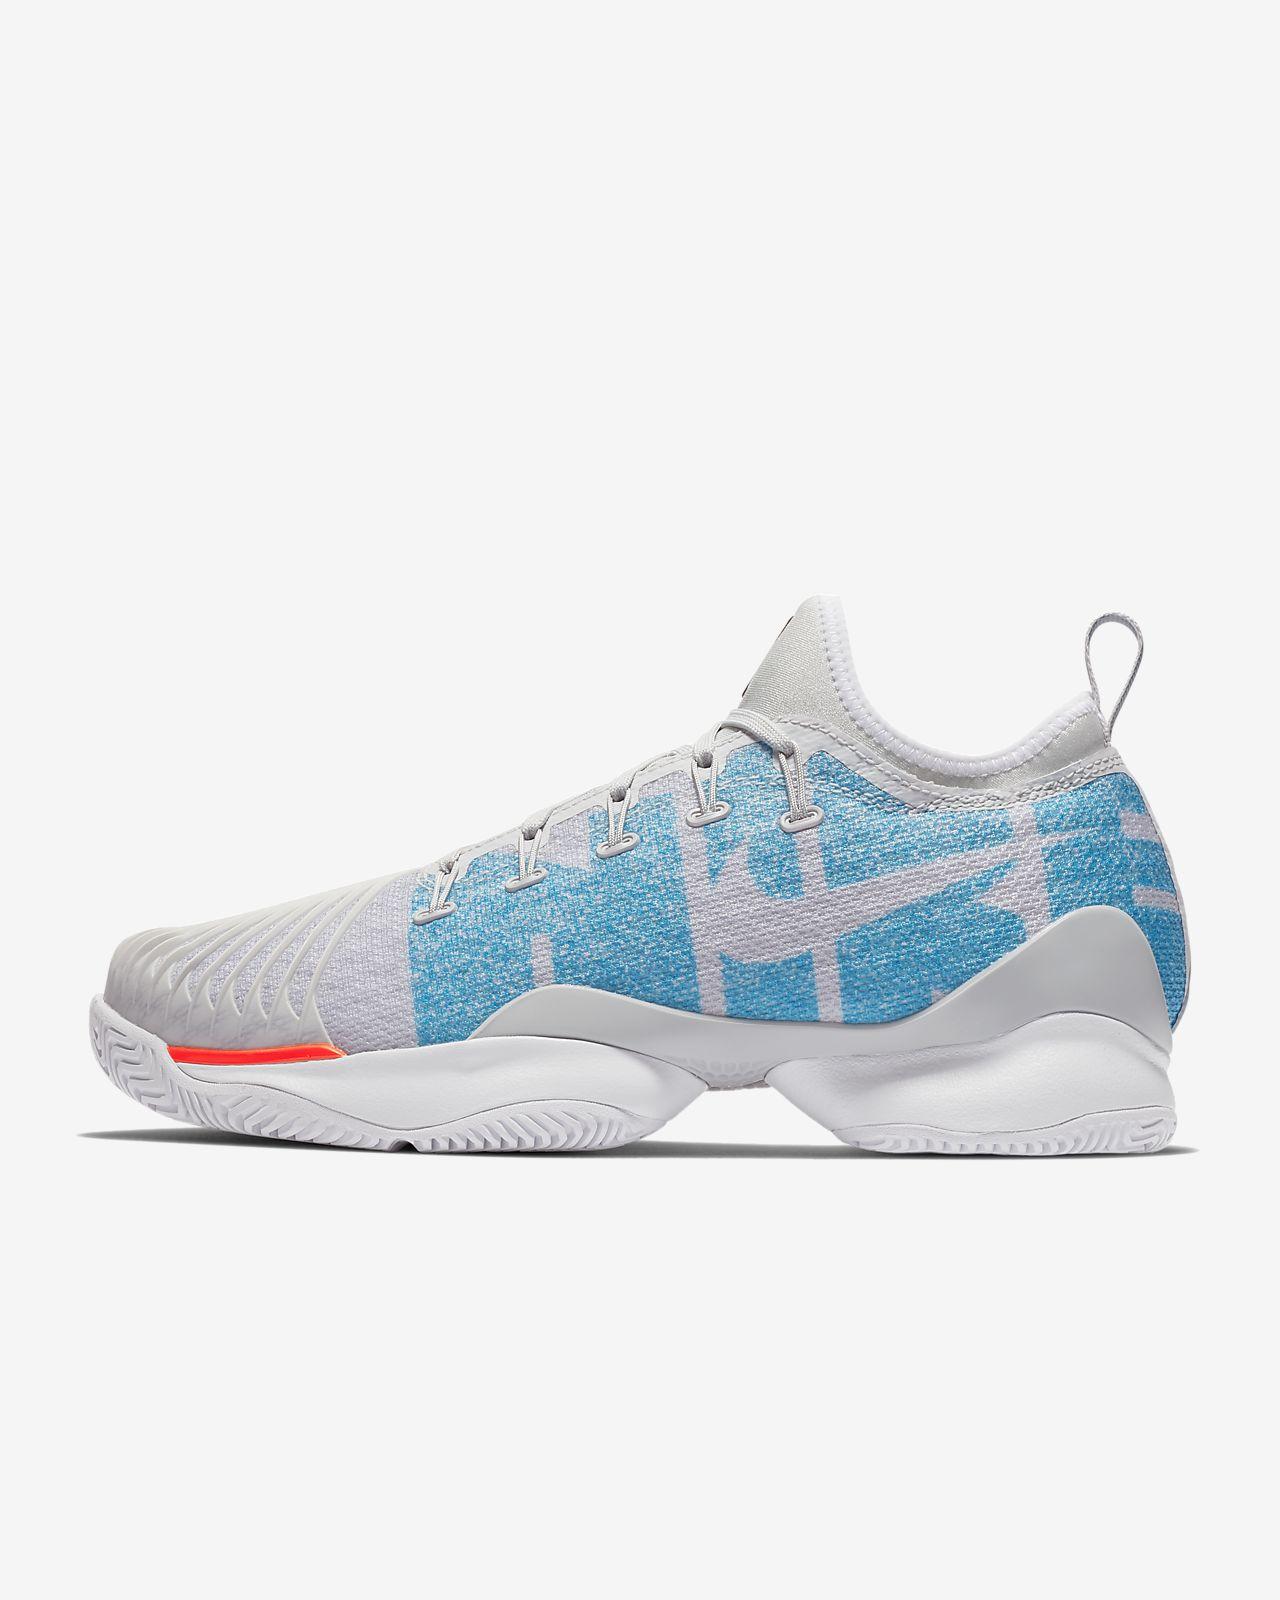 on sale 5181e 48100 ... amazon nikecourt air zoom ultra react womens hard court tennis shoe  df7e0 ad46b